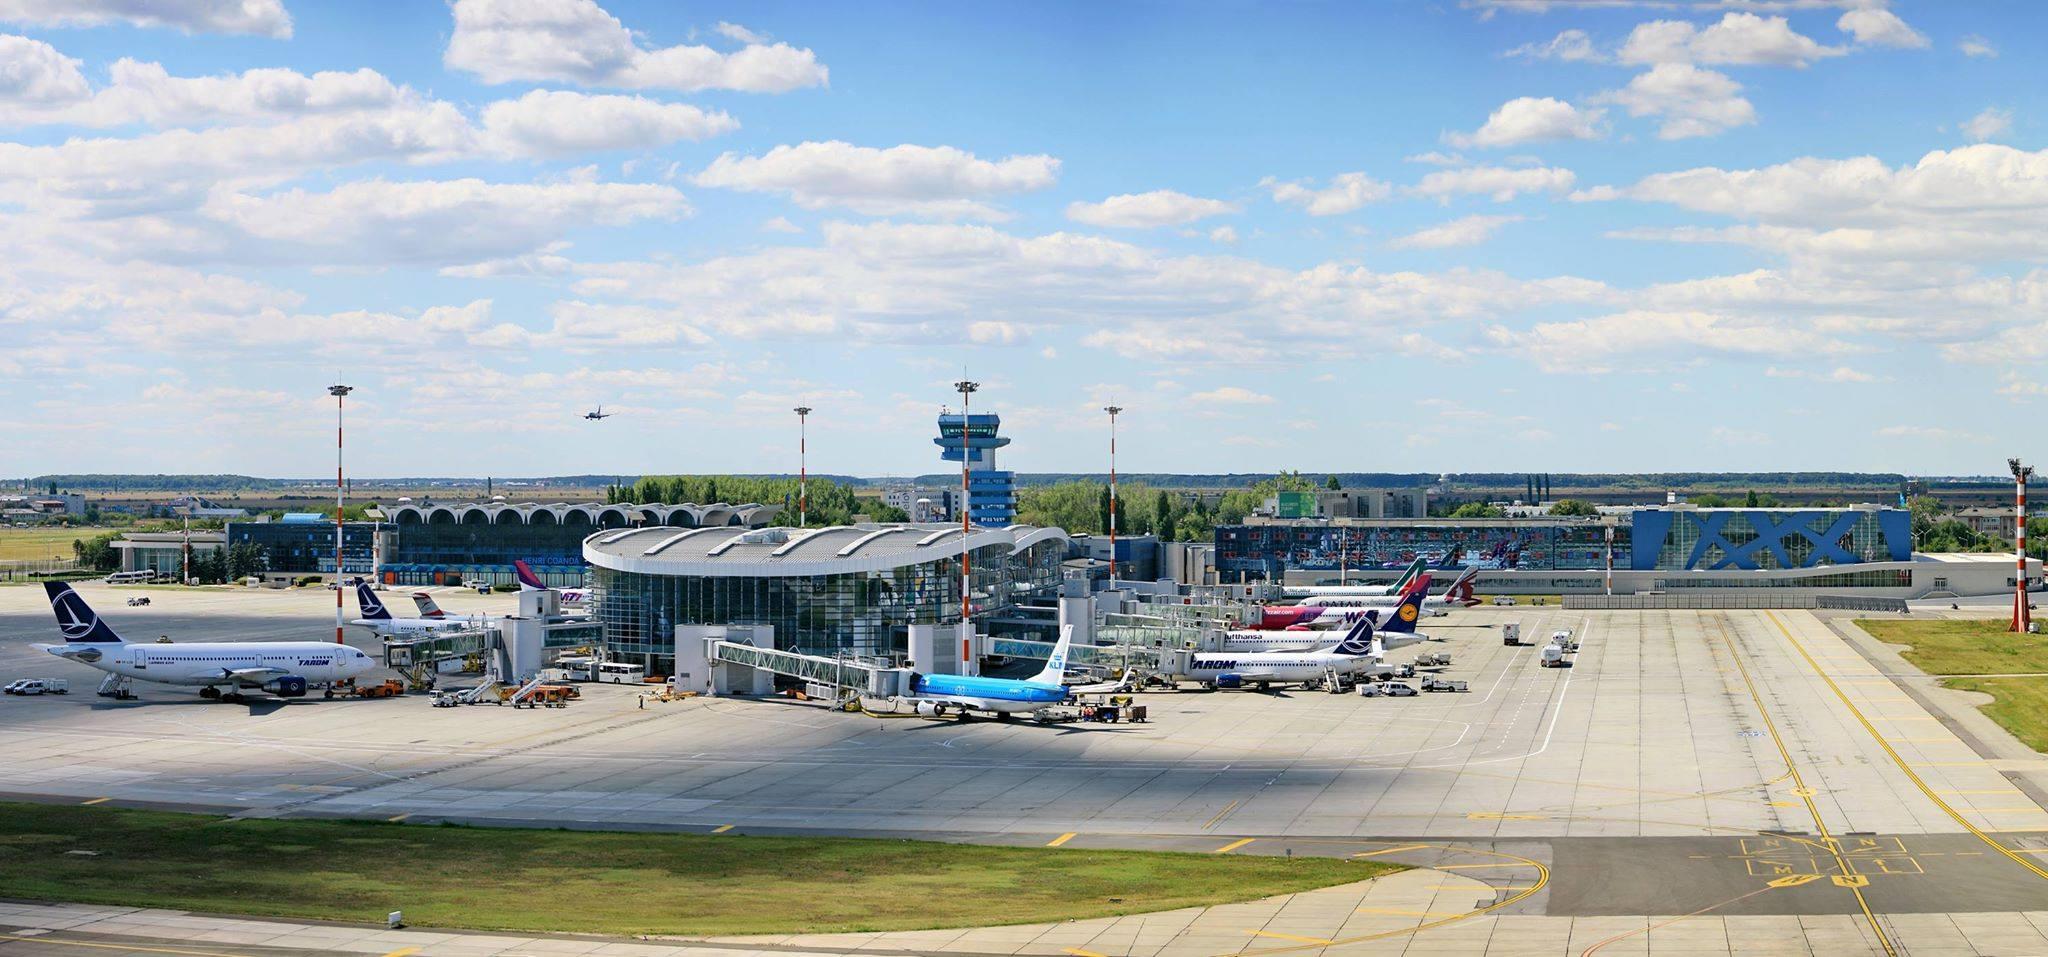 Pleci direct de la aeroport cu masina dorita – afla cum